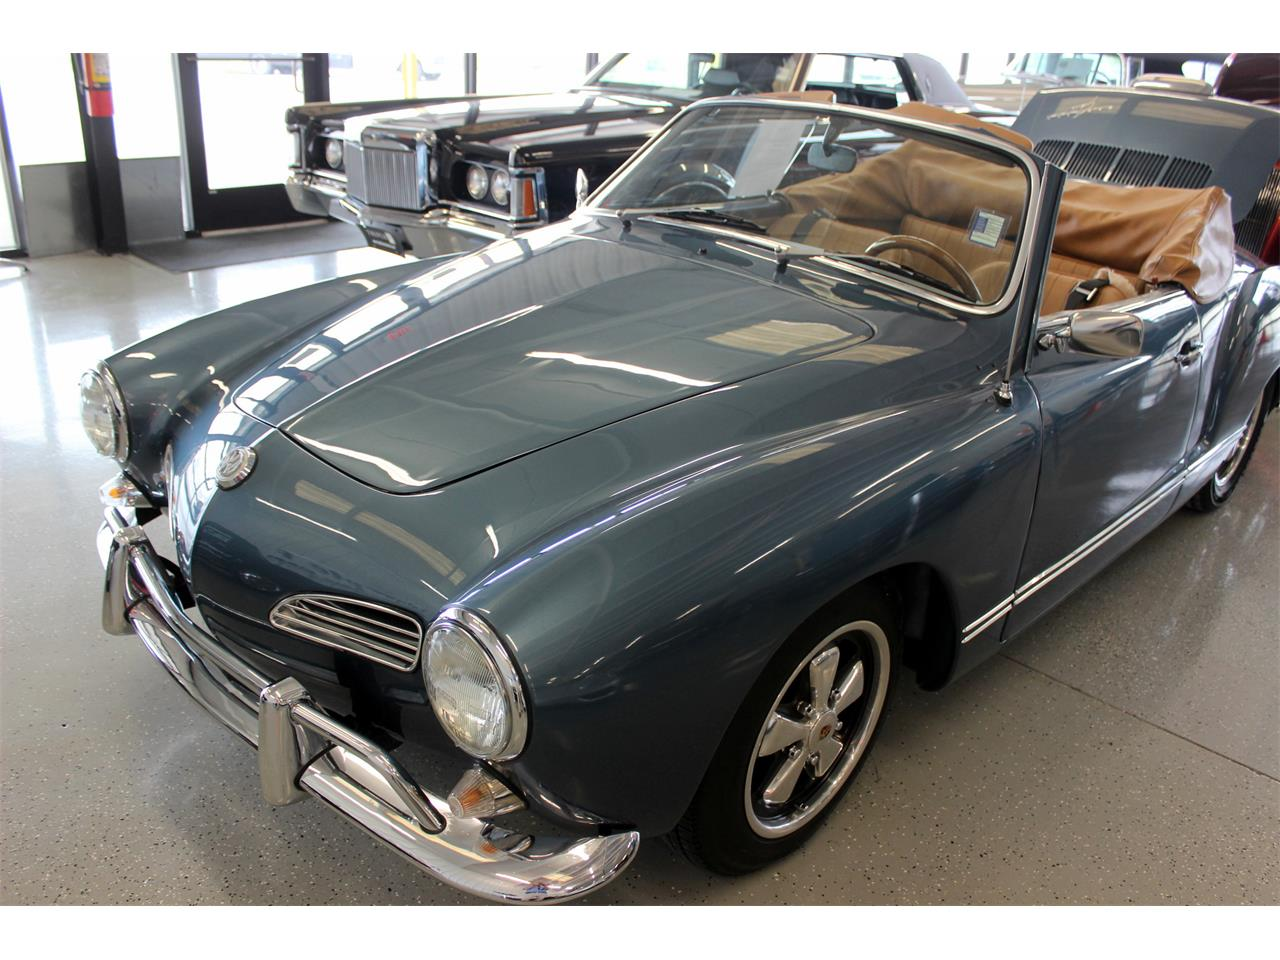 1a77efe4464854 1968 Volkswagen Karmann Ghia for Sale | ClassicCars.com | CC-1216089